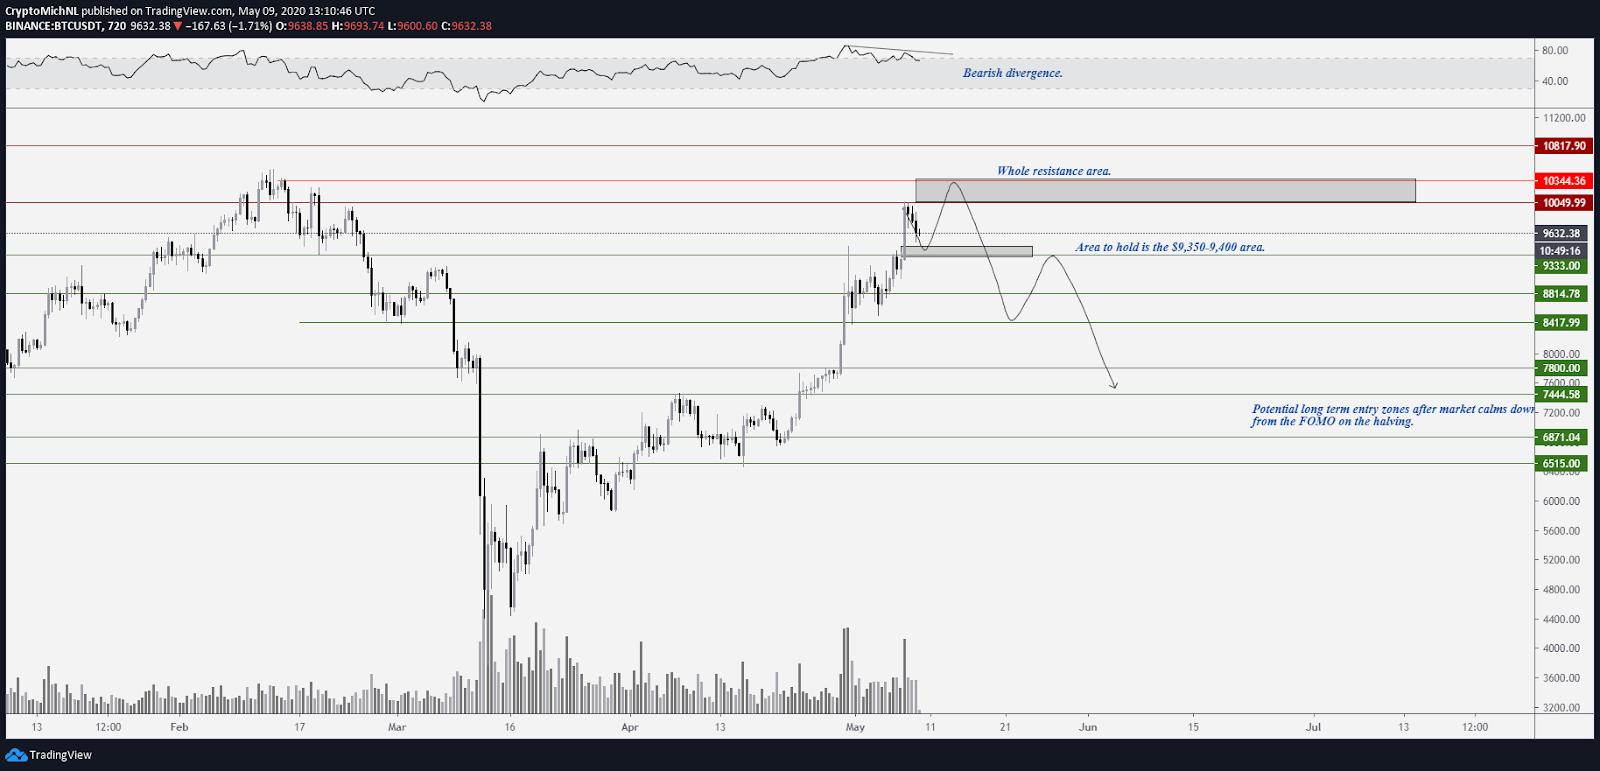 BTC USDT 12-hour chart. Source: TradingView